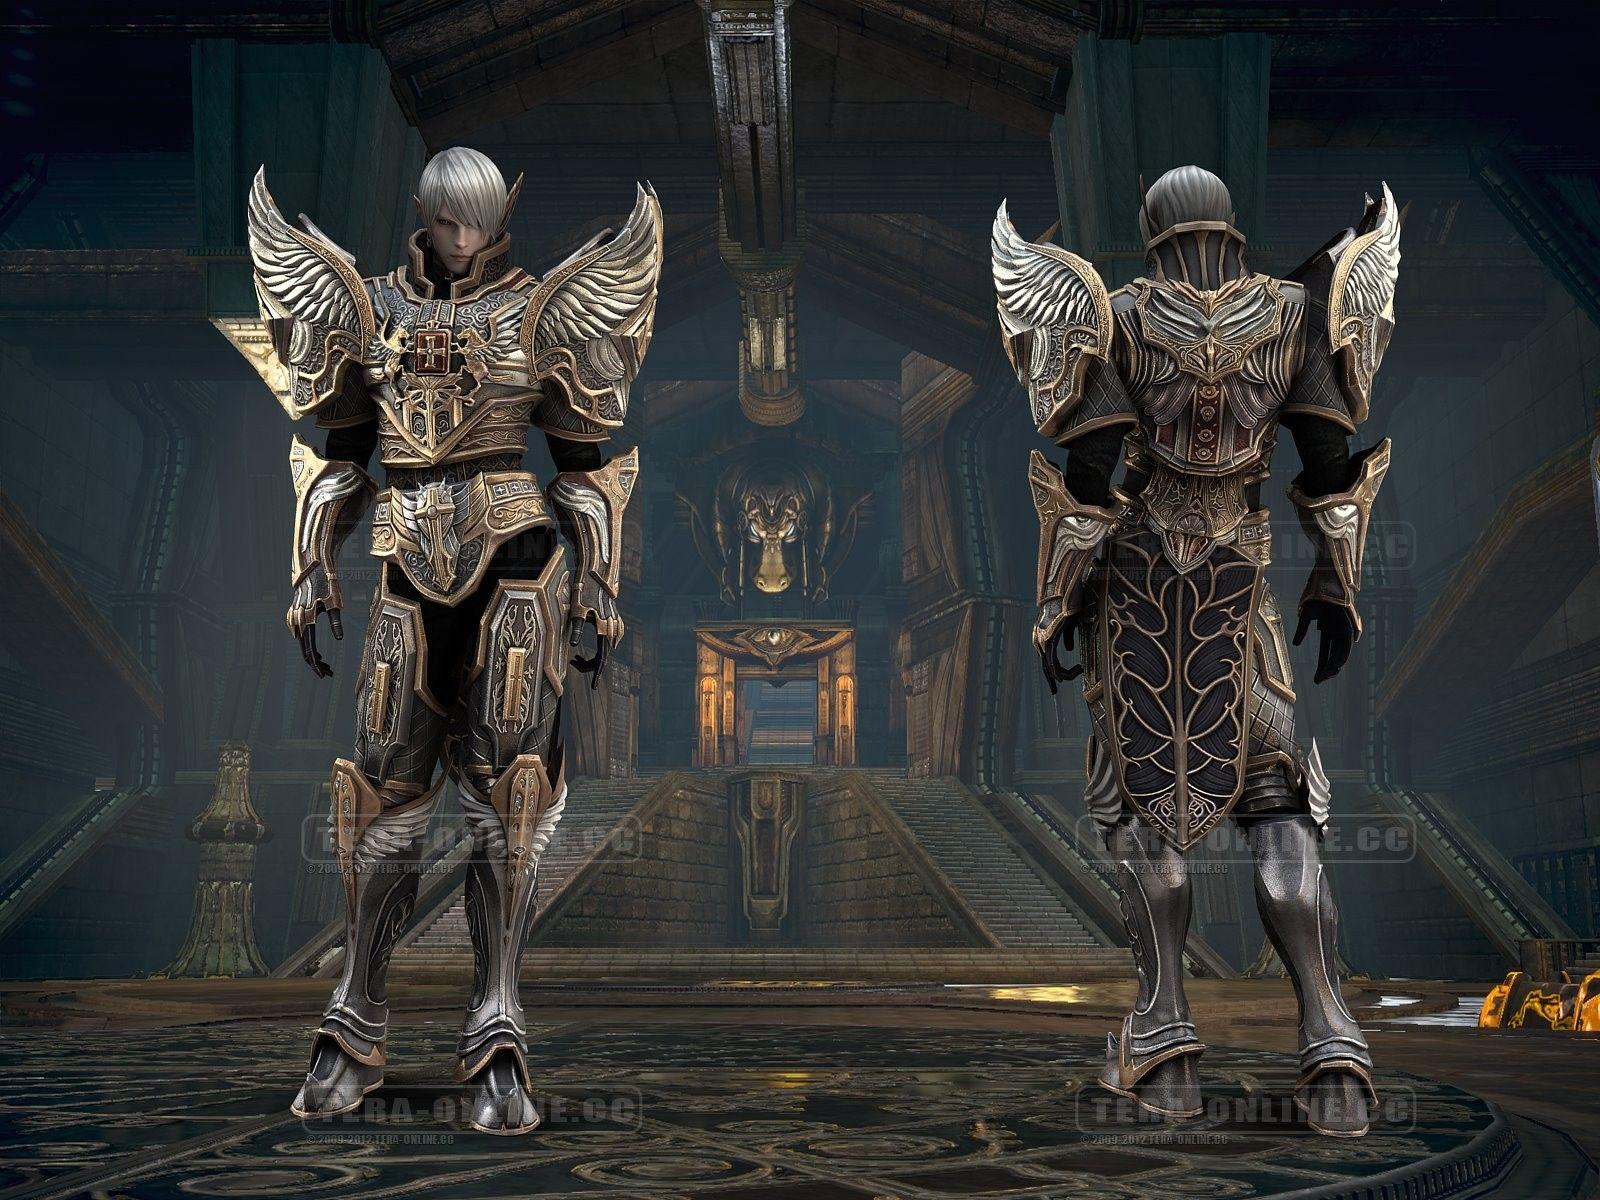 Tera High Elf Armor Skyrim Mod - Year of Clean Water